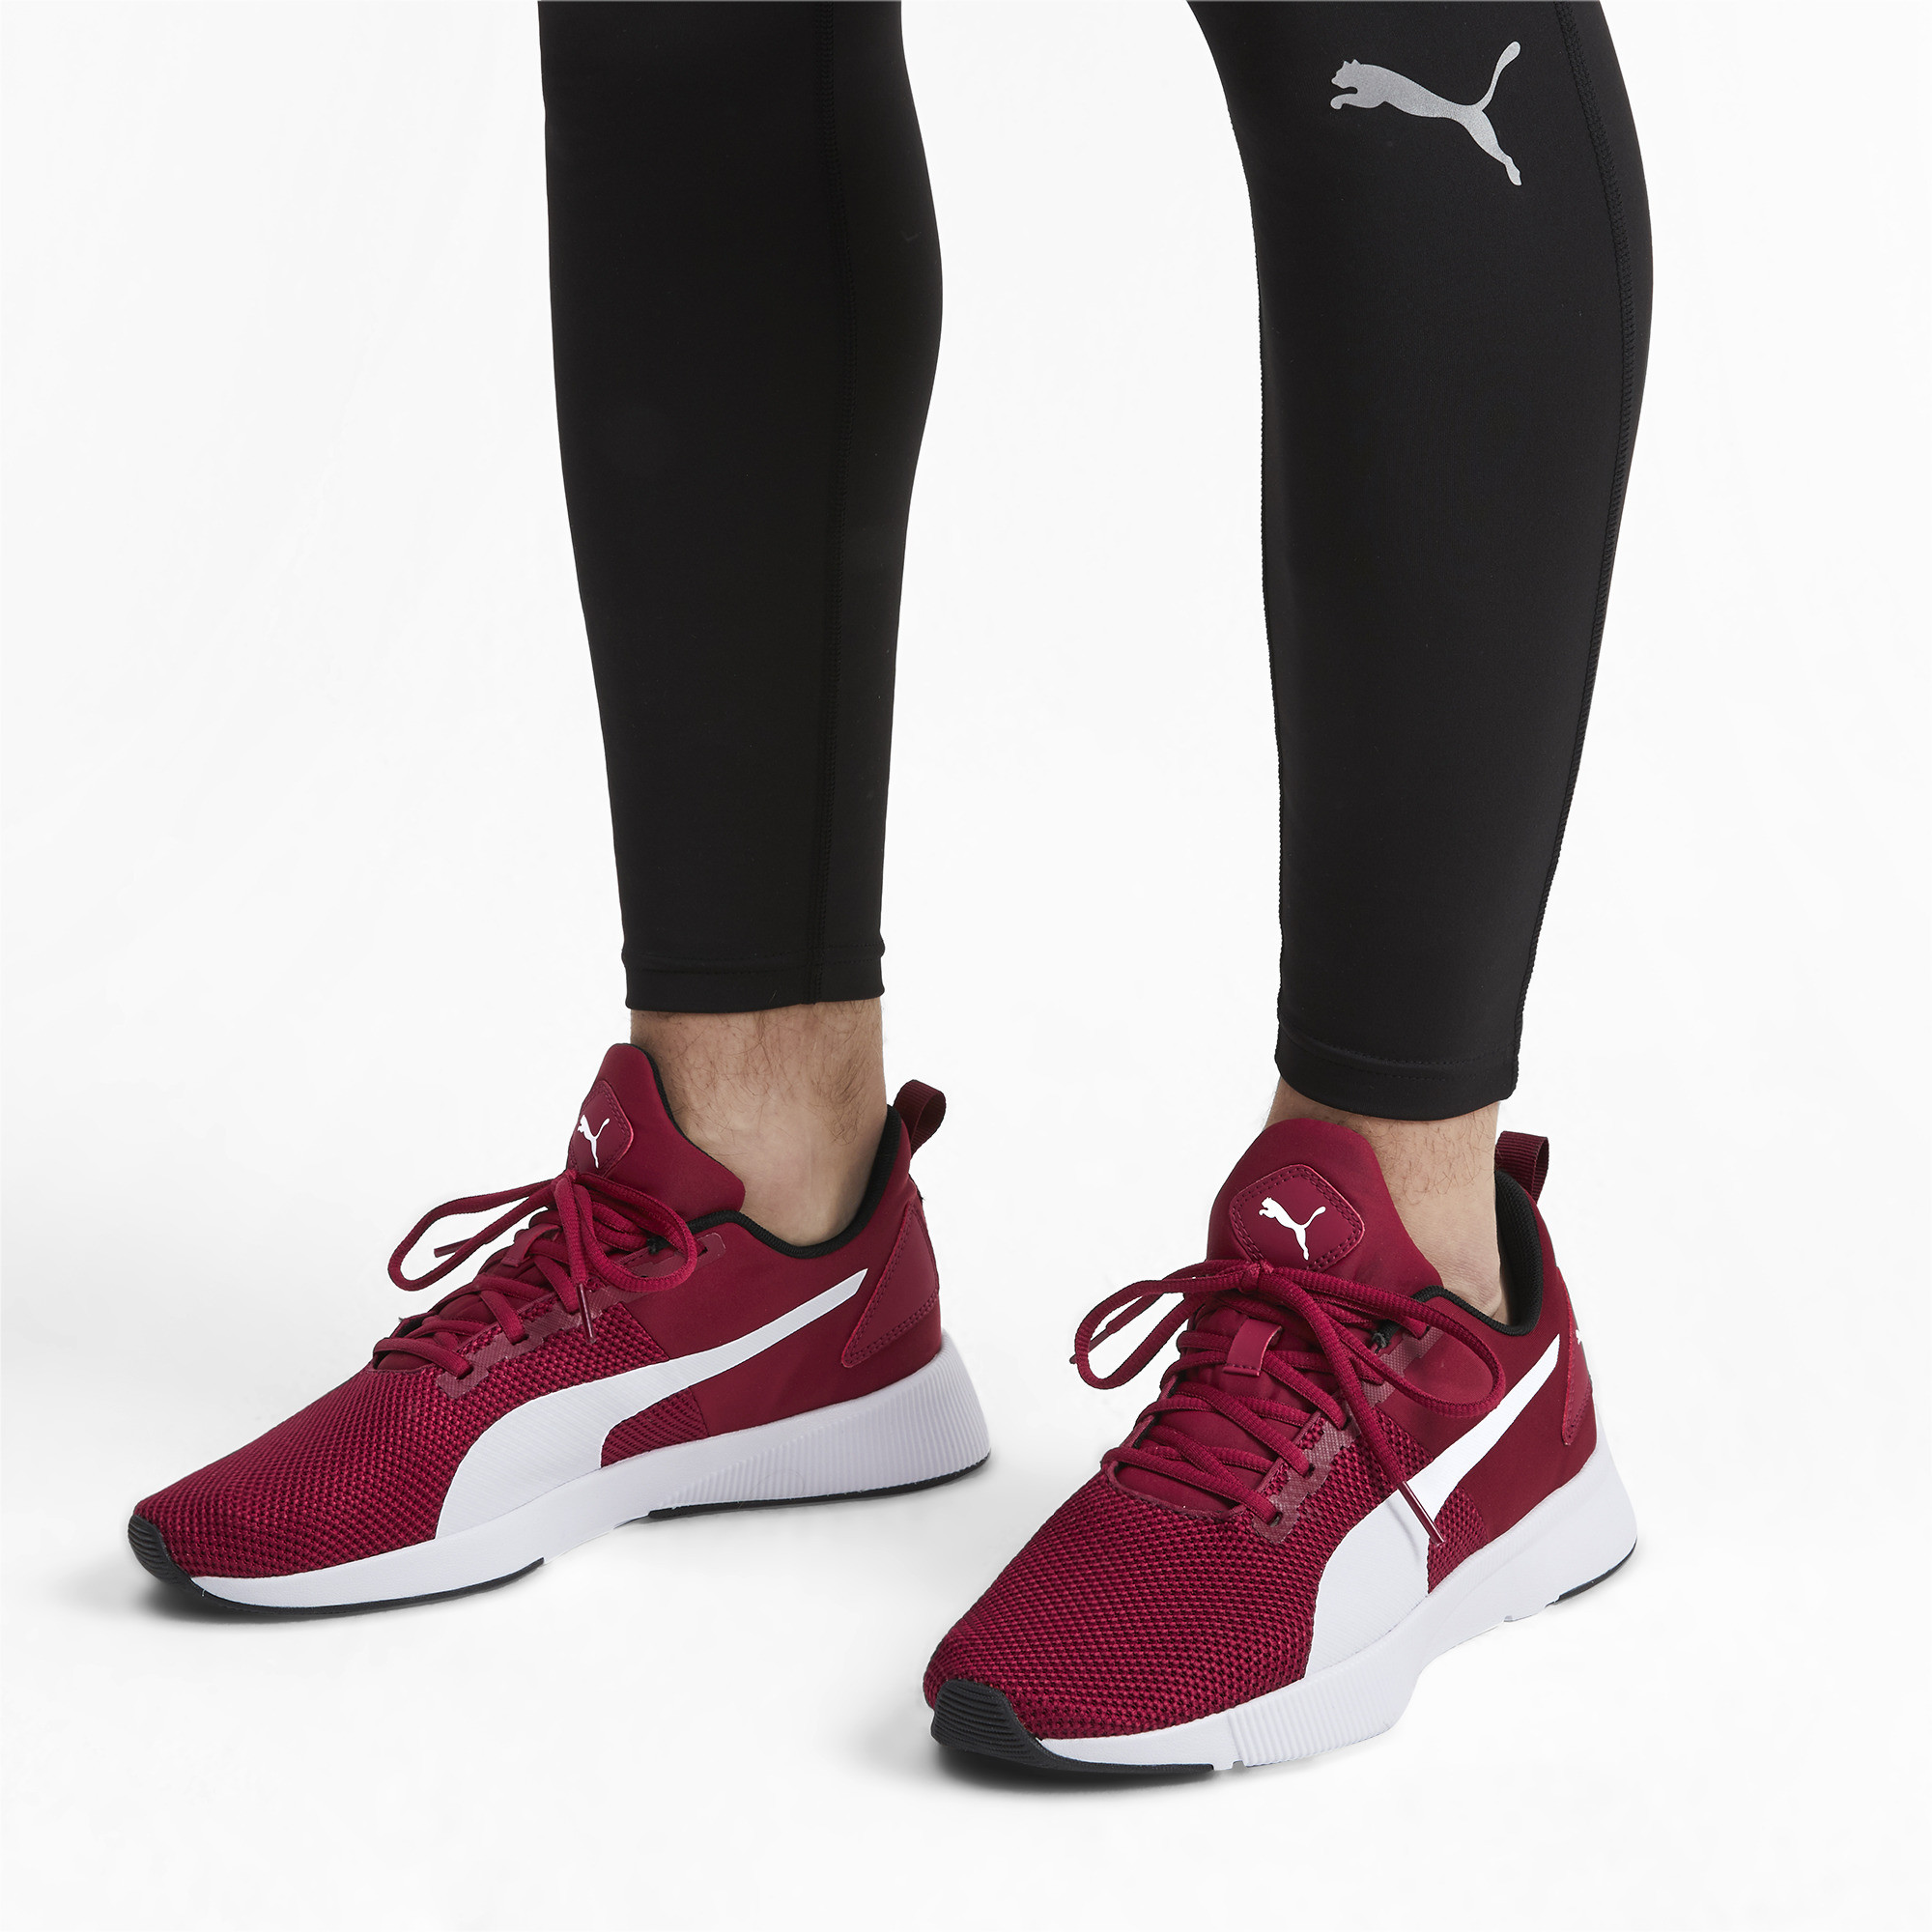 PUMA-Flyer-Runner-Running-Shoes-Mens-Shoe-Running thumbnail 24